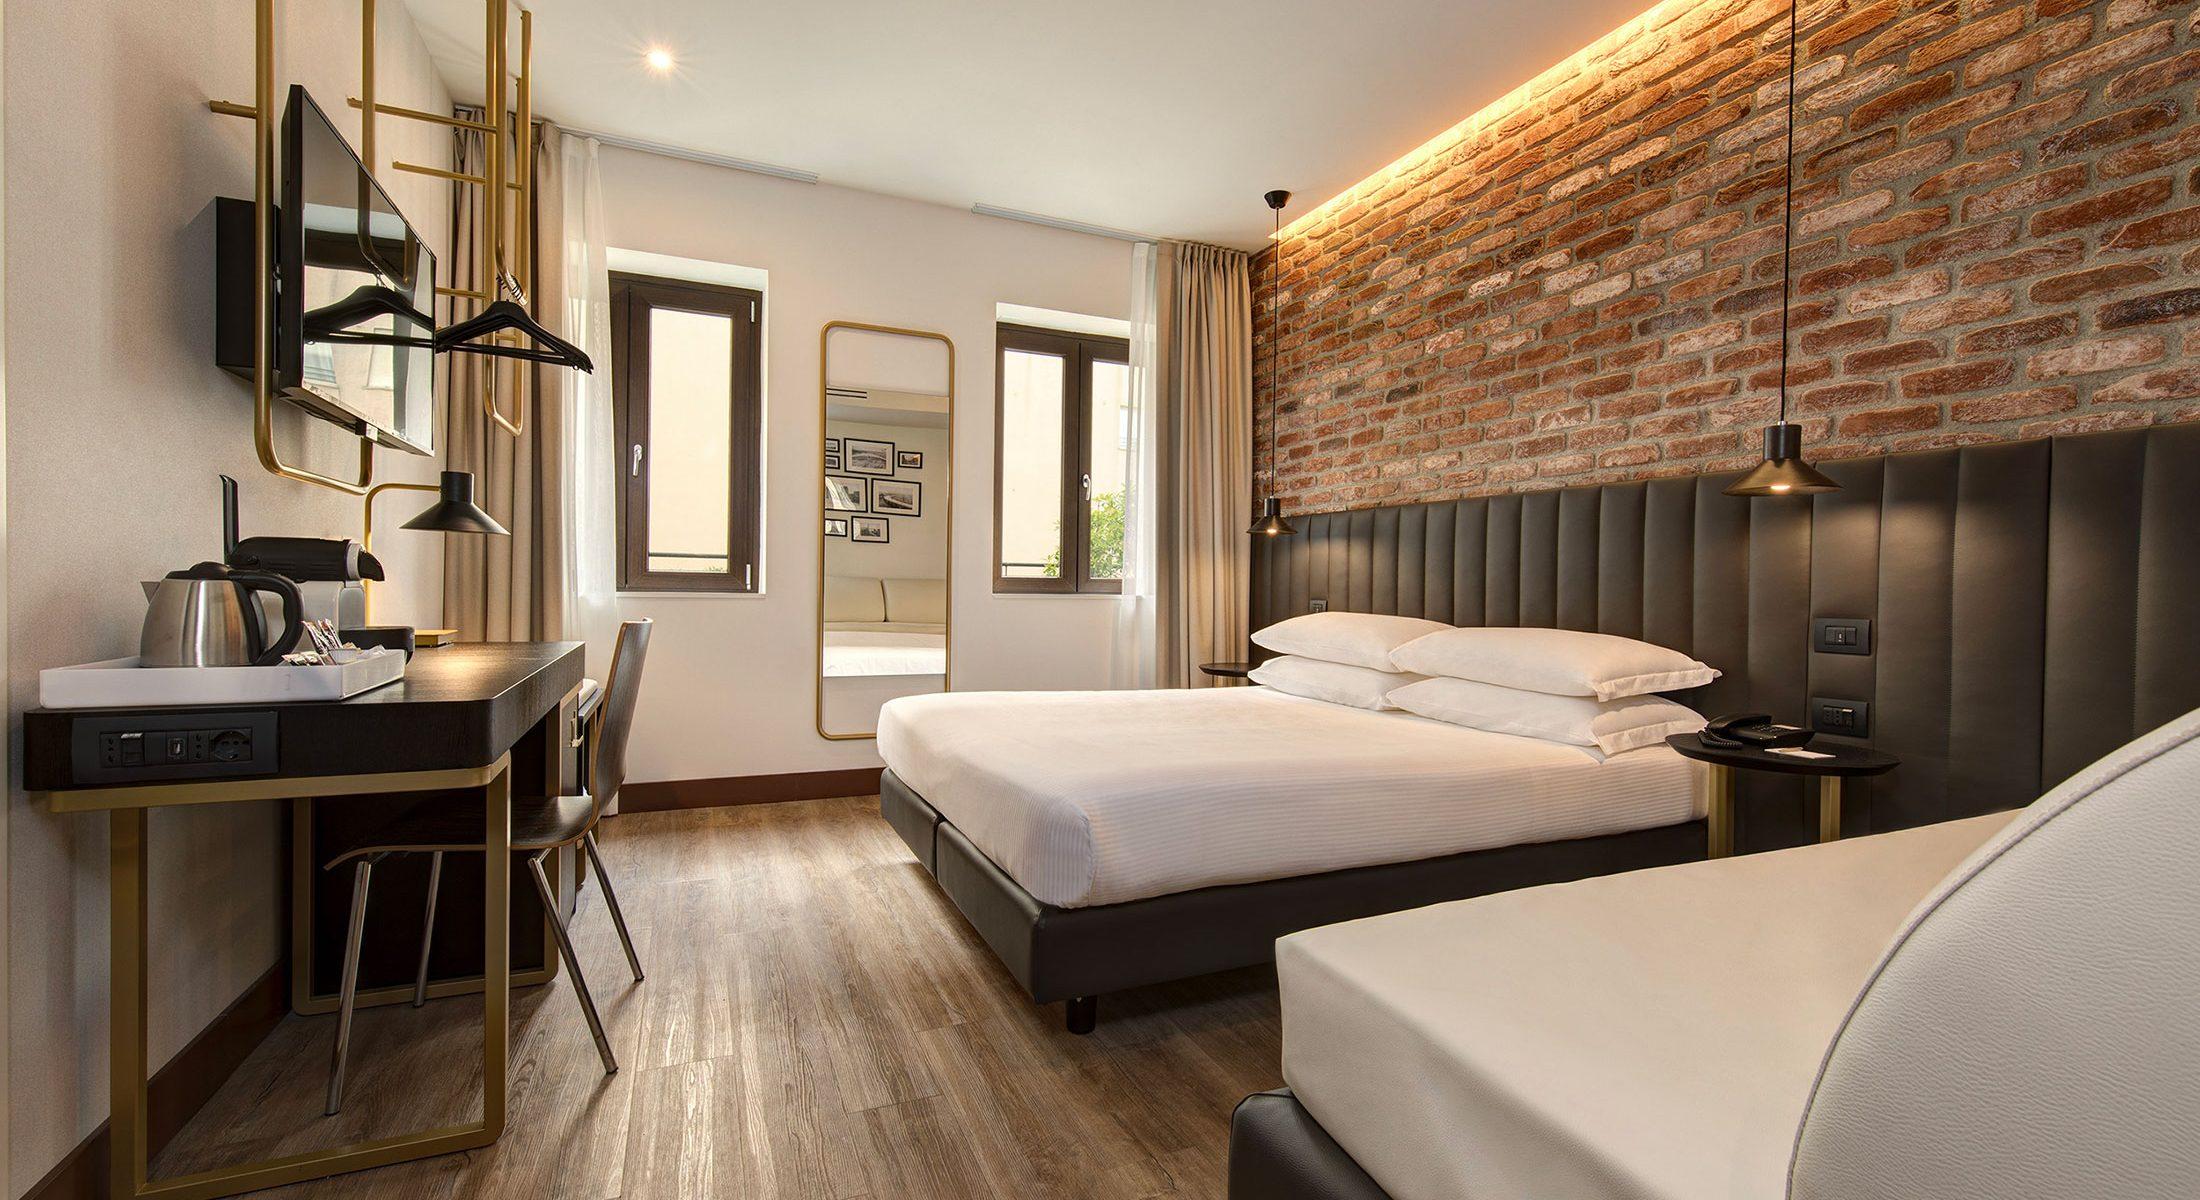 Hotel Tritone Venezia Mestre: Hotel 4 stelle Stazione di Mestre